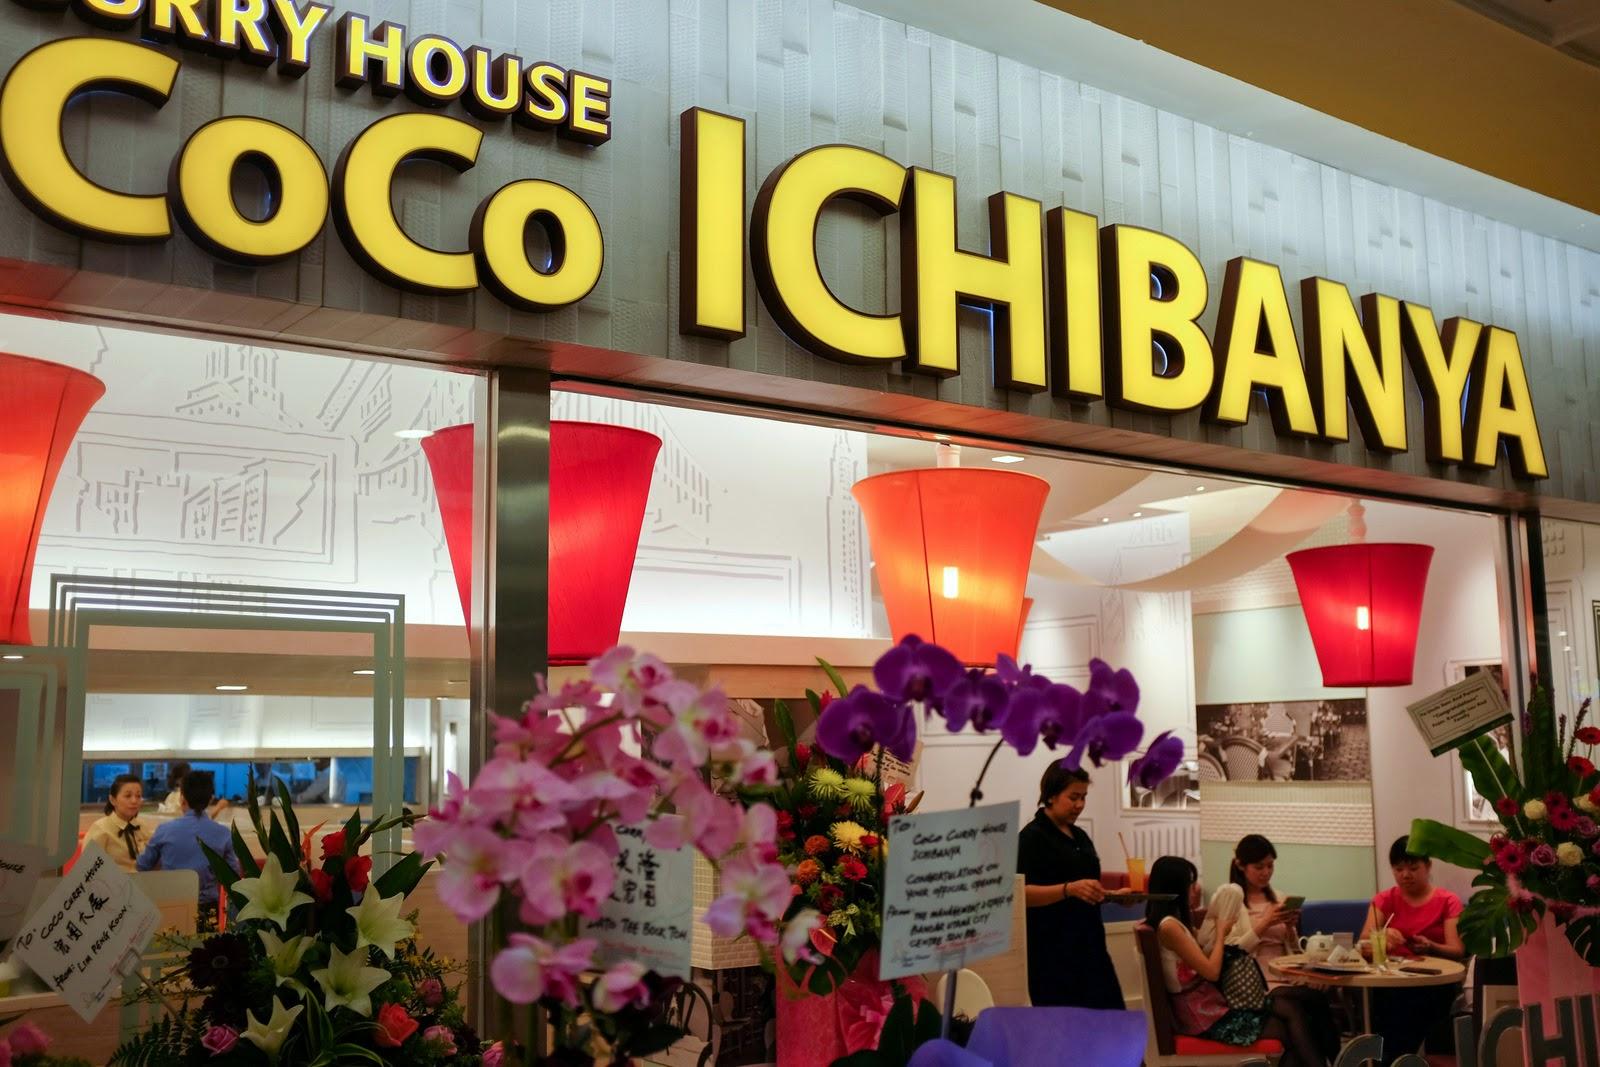 coco ichibanya curry house @ 1 utama